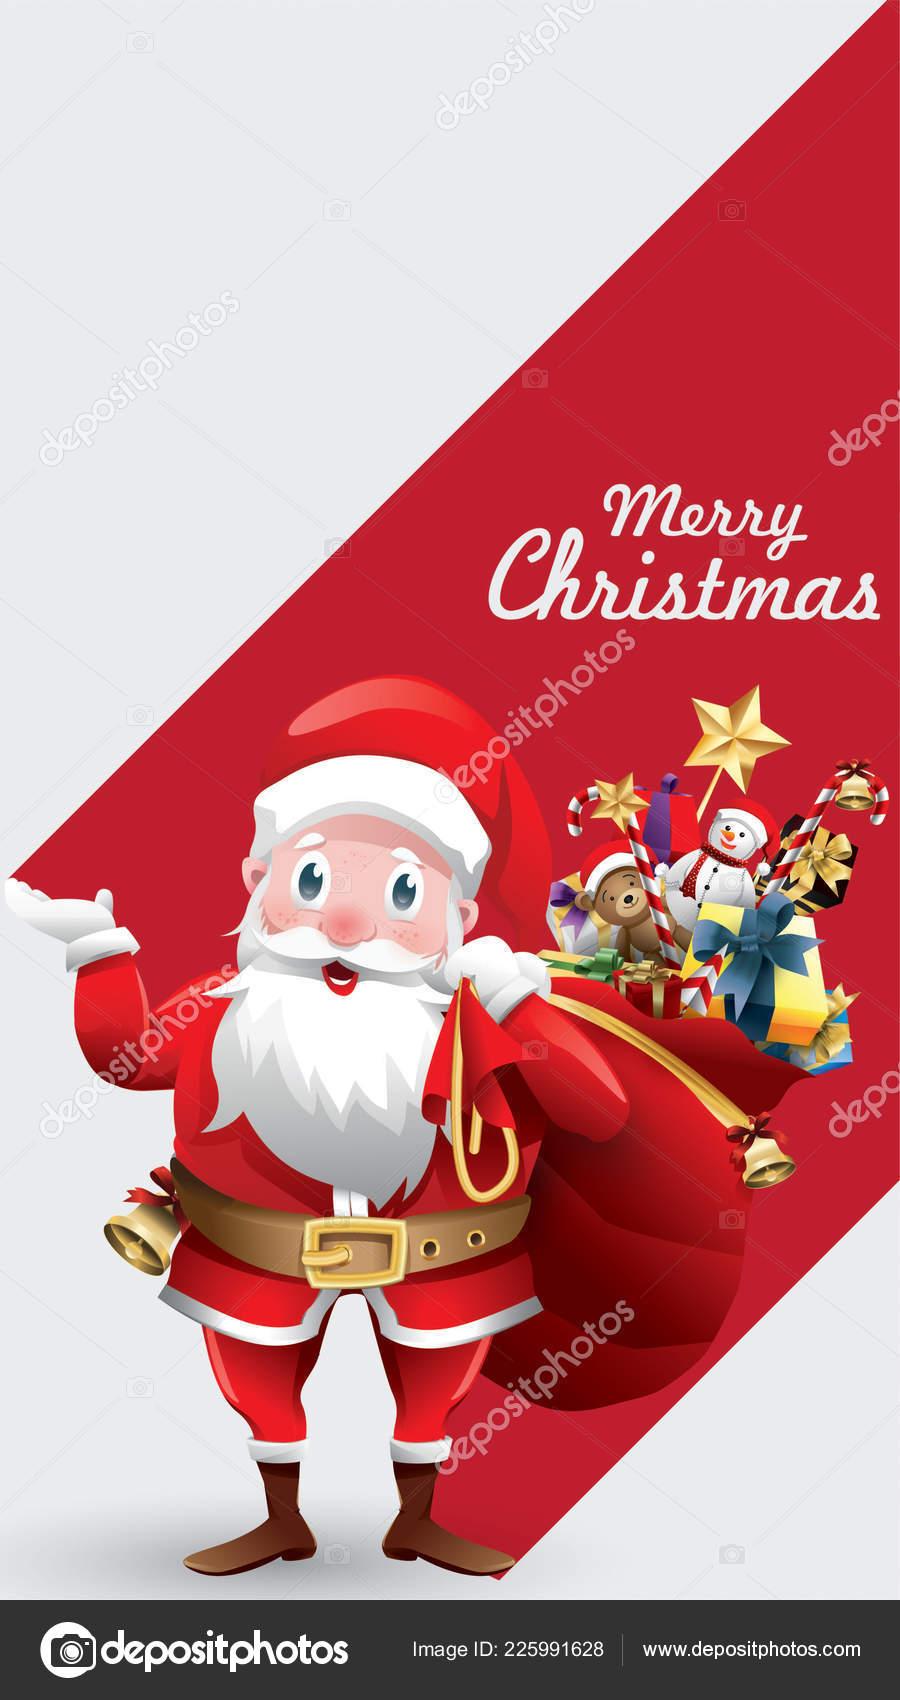 Merry Xmas Cartoon Pics : merry, cartoon, Merry, Christmas, Happy, Cartoon, Santa, Claus, Vector, Image, Vavectors, Stock, 225991628